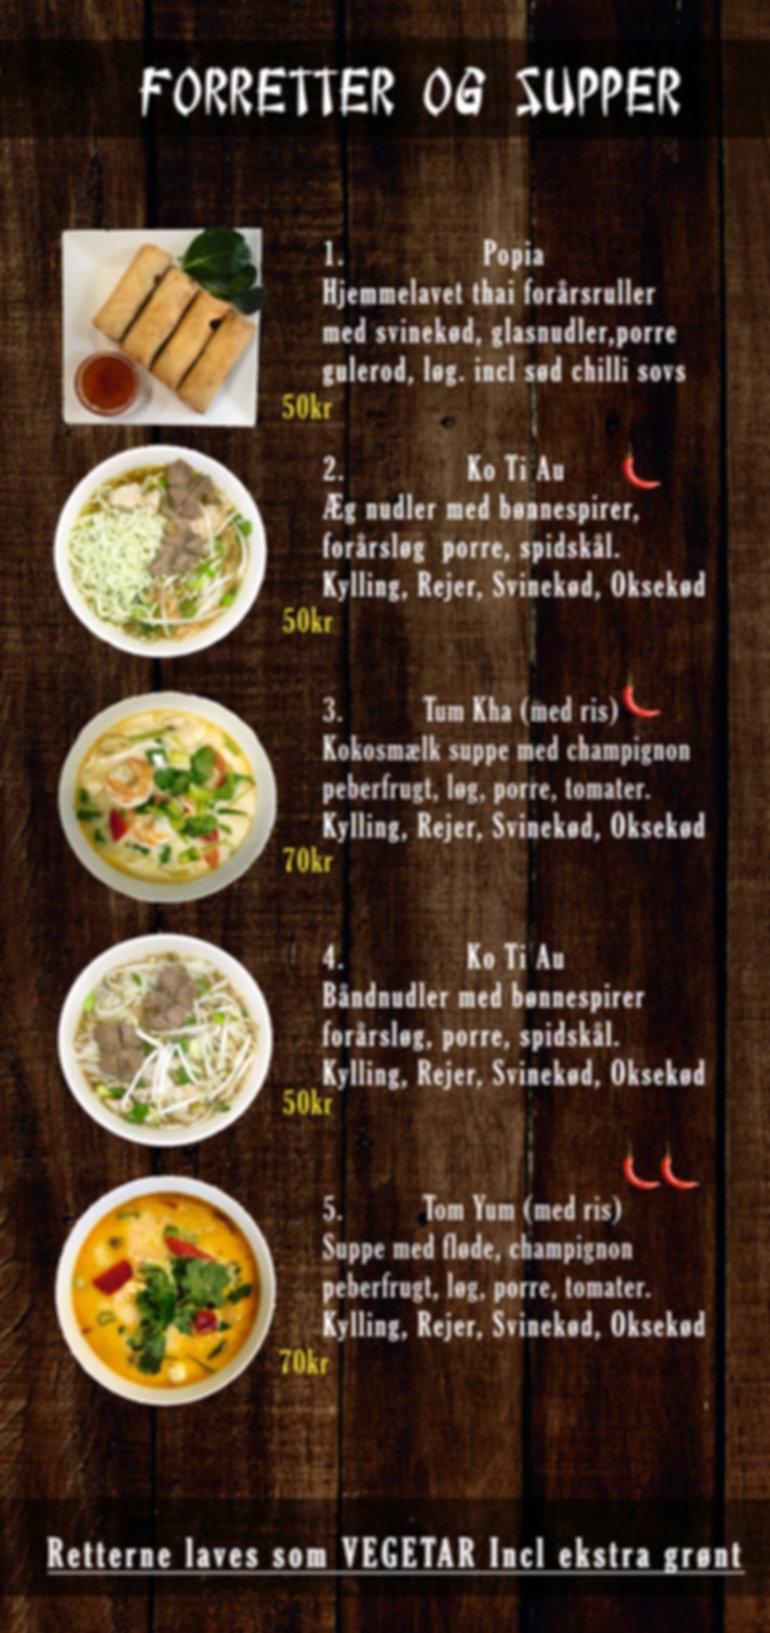 thai menukortfront10-11-18 til print 1-5